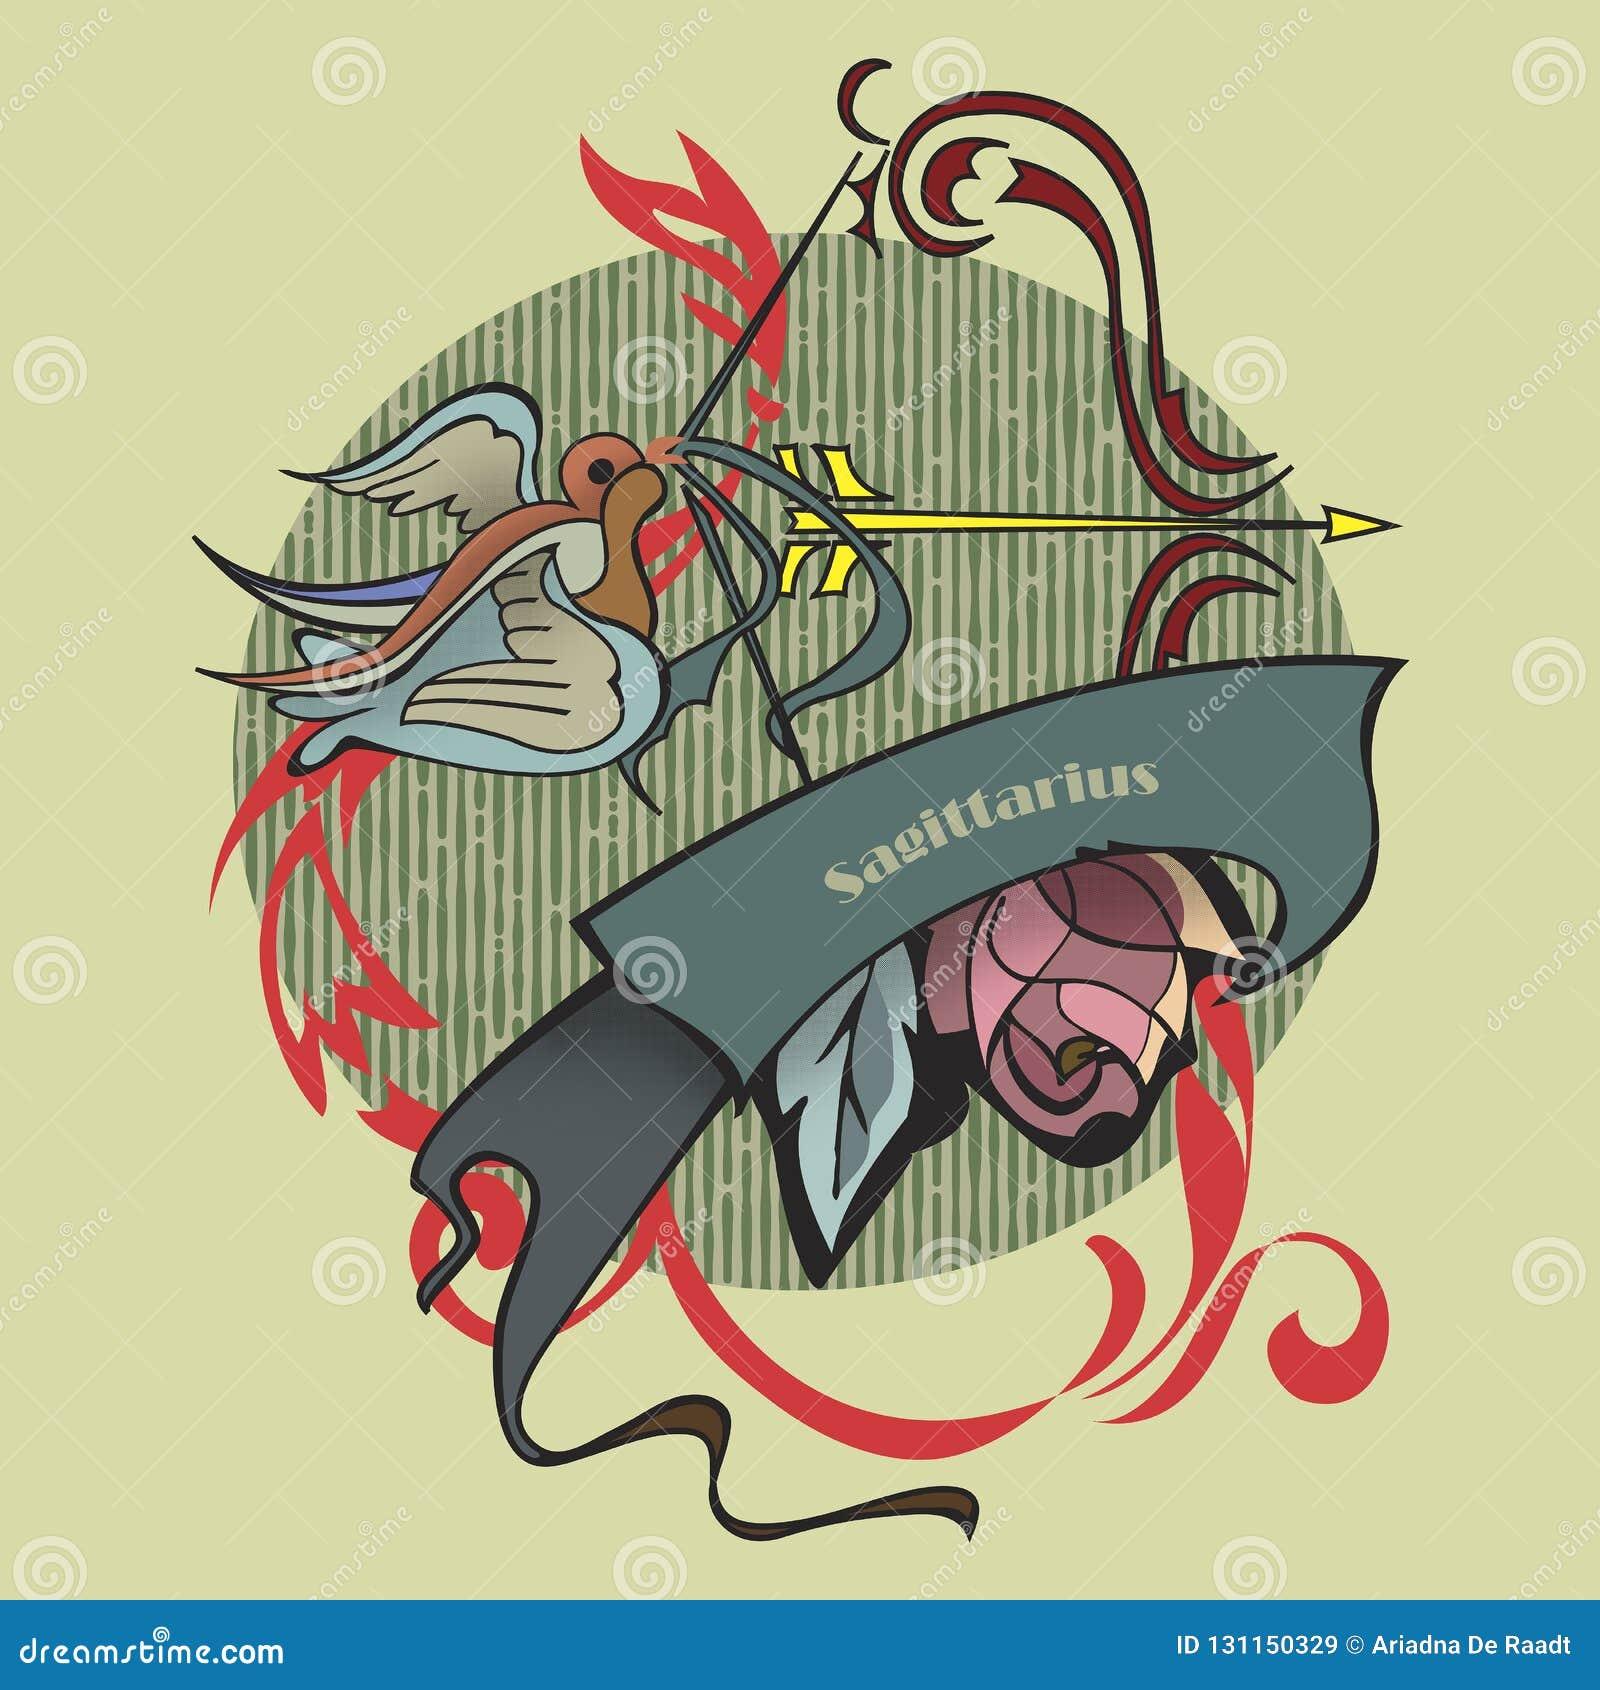 a35b8e7af6195 Sagittarius tattoo stock illustration. Illustration of roses - 131150329